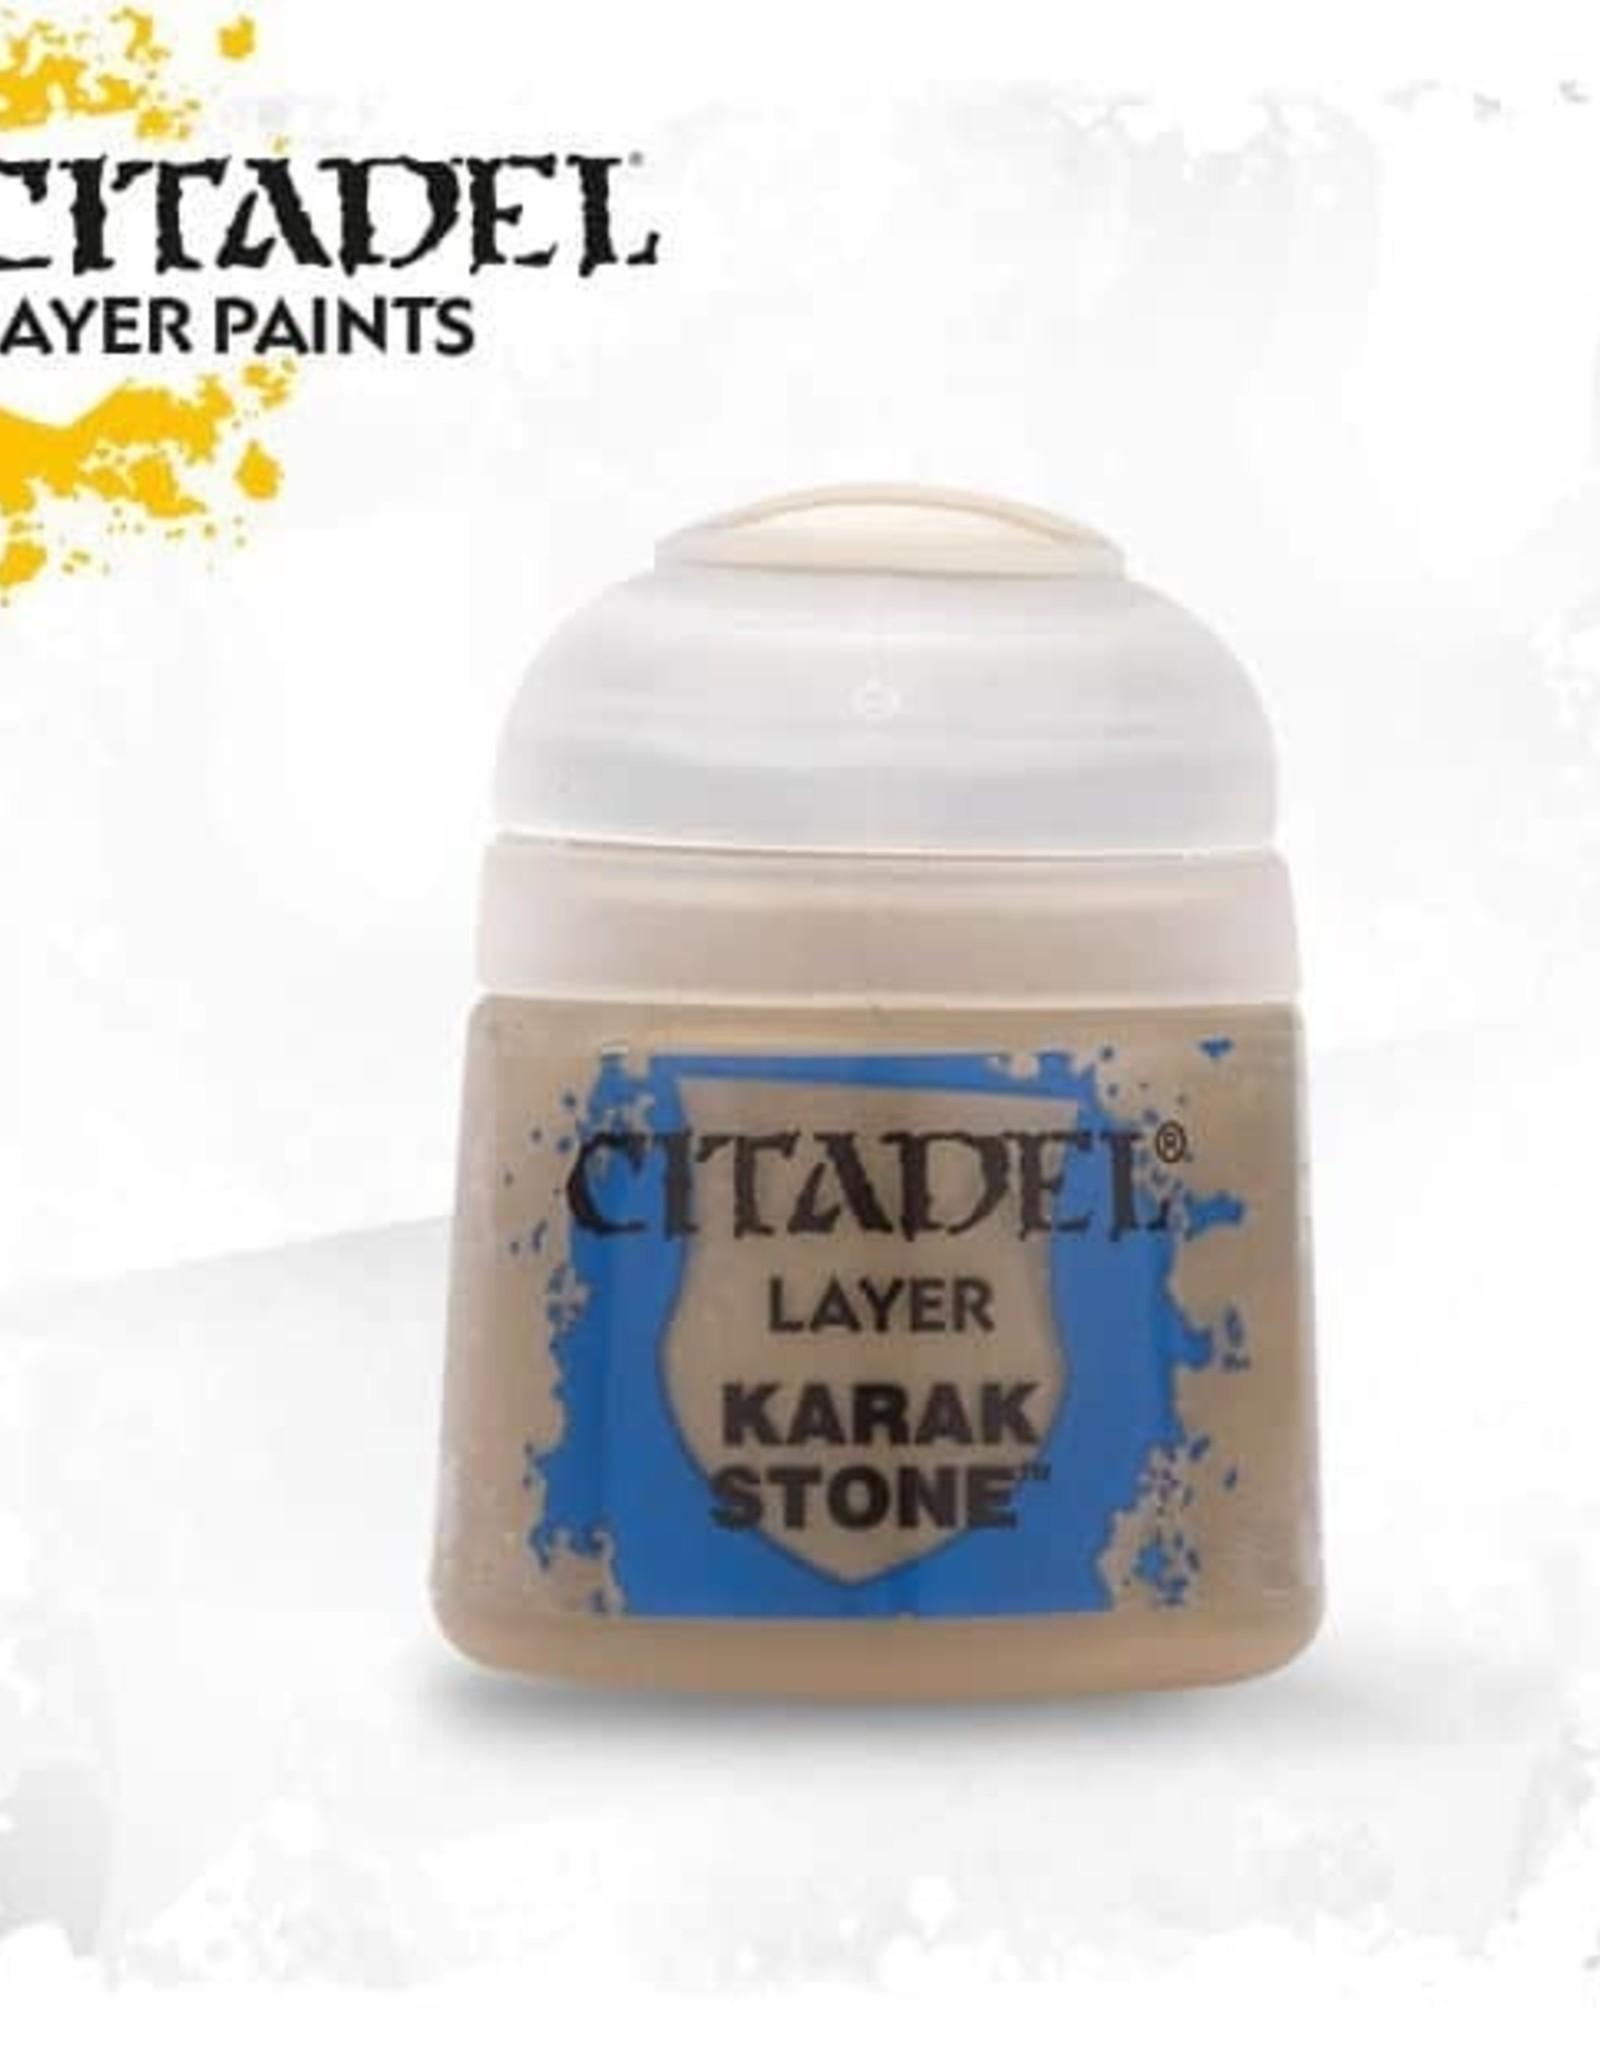 Citadel Layer Paint: Karak Stone